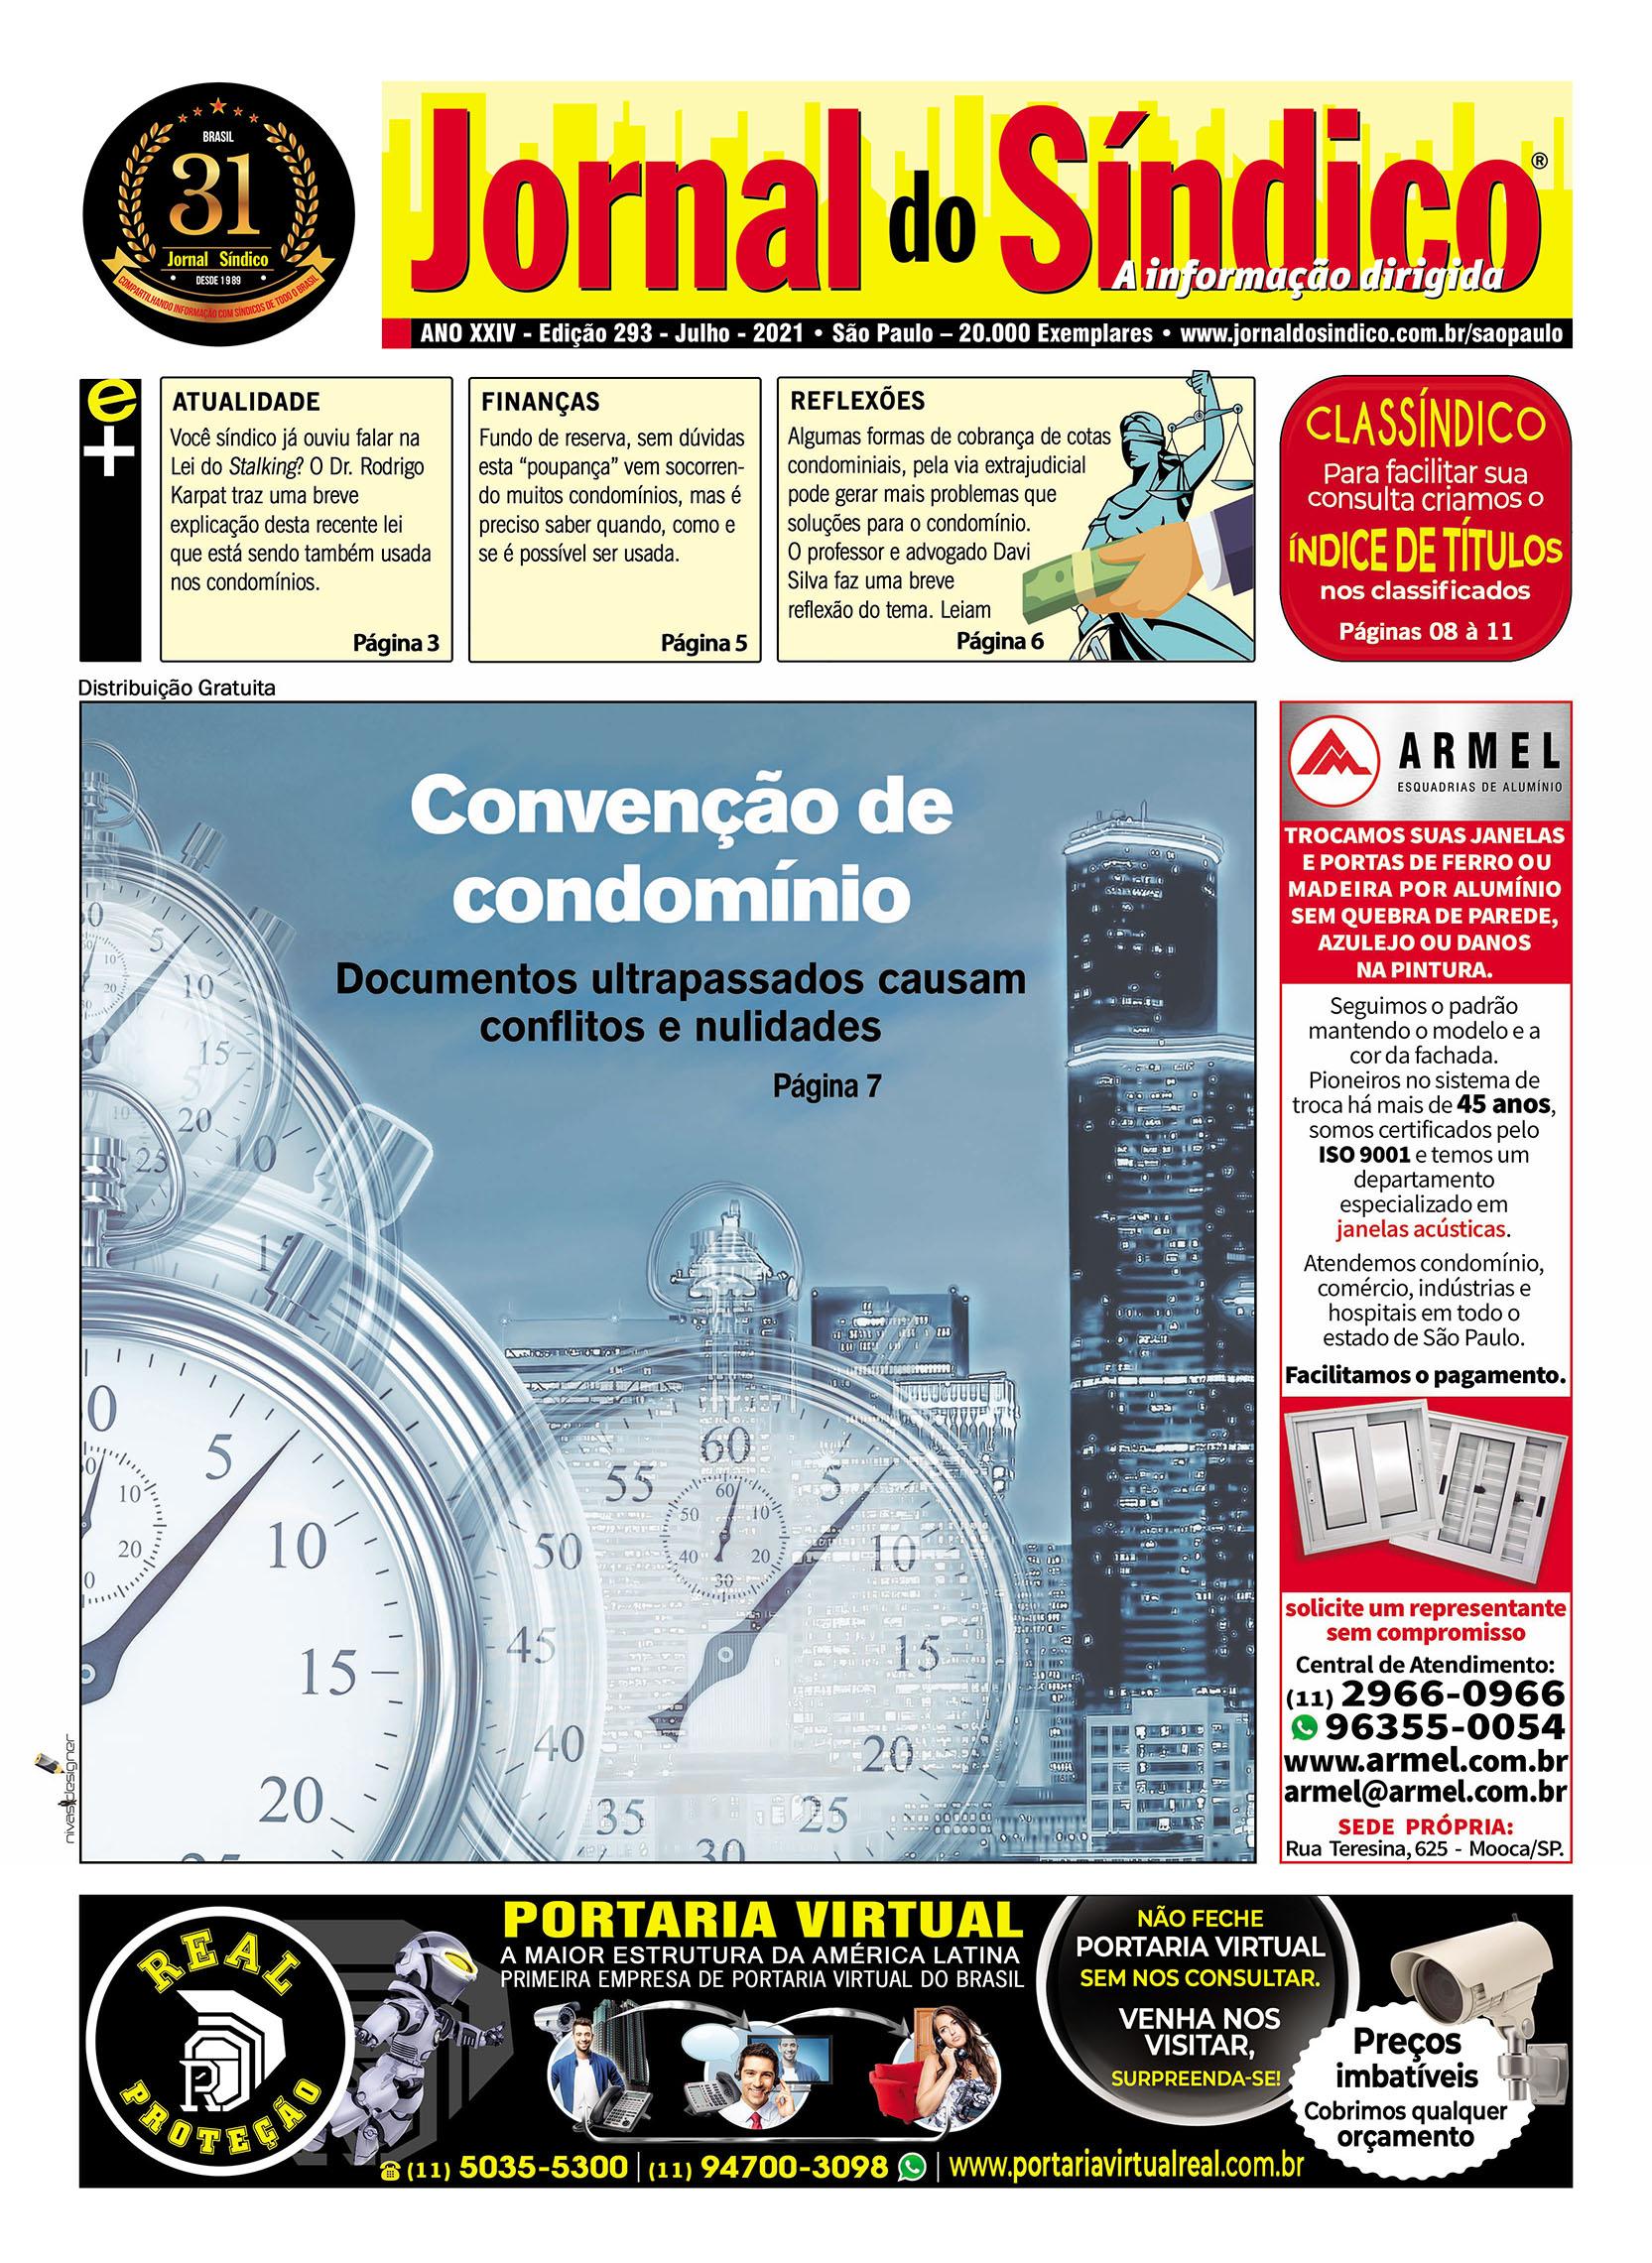 Jornal-Ediç 293 - Julho 2021.indd